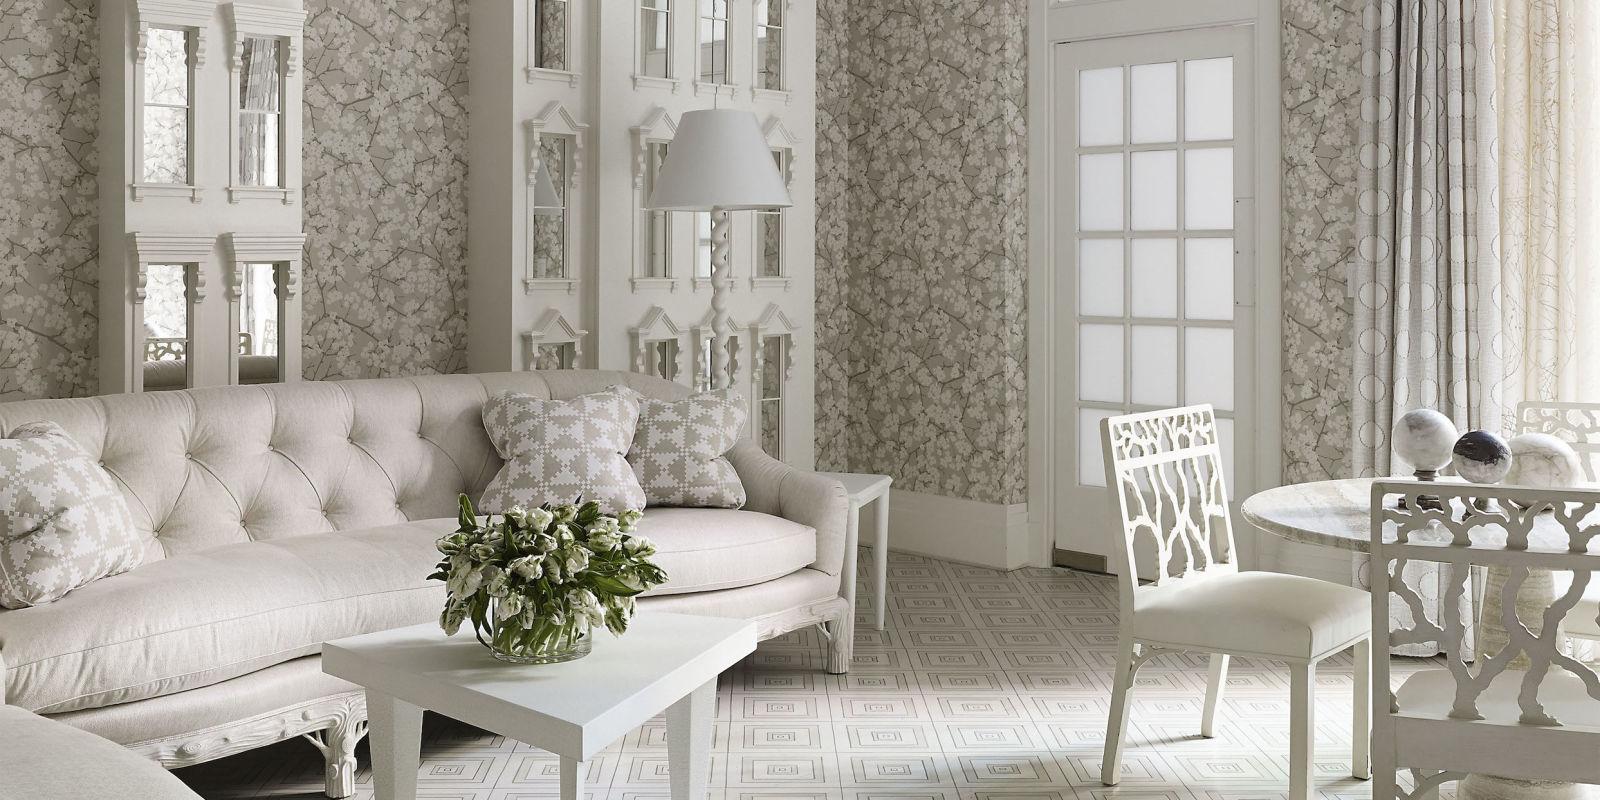 20 White Living Room Furniture Ideas